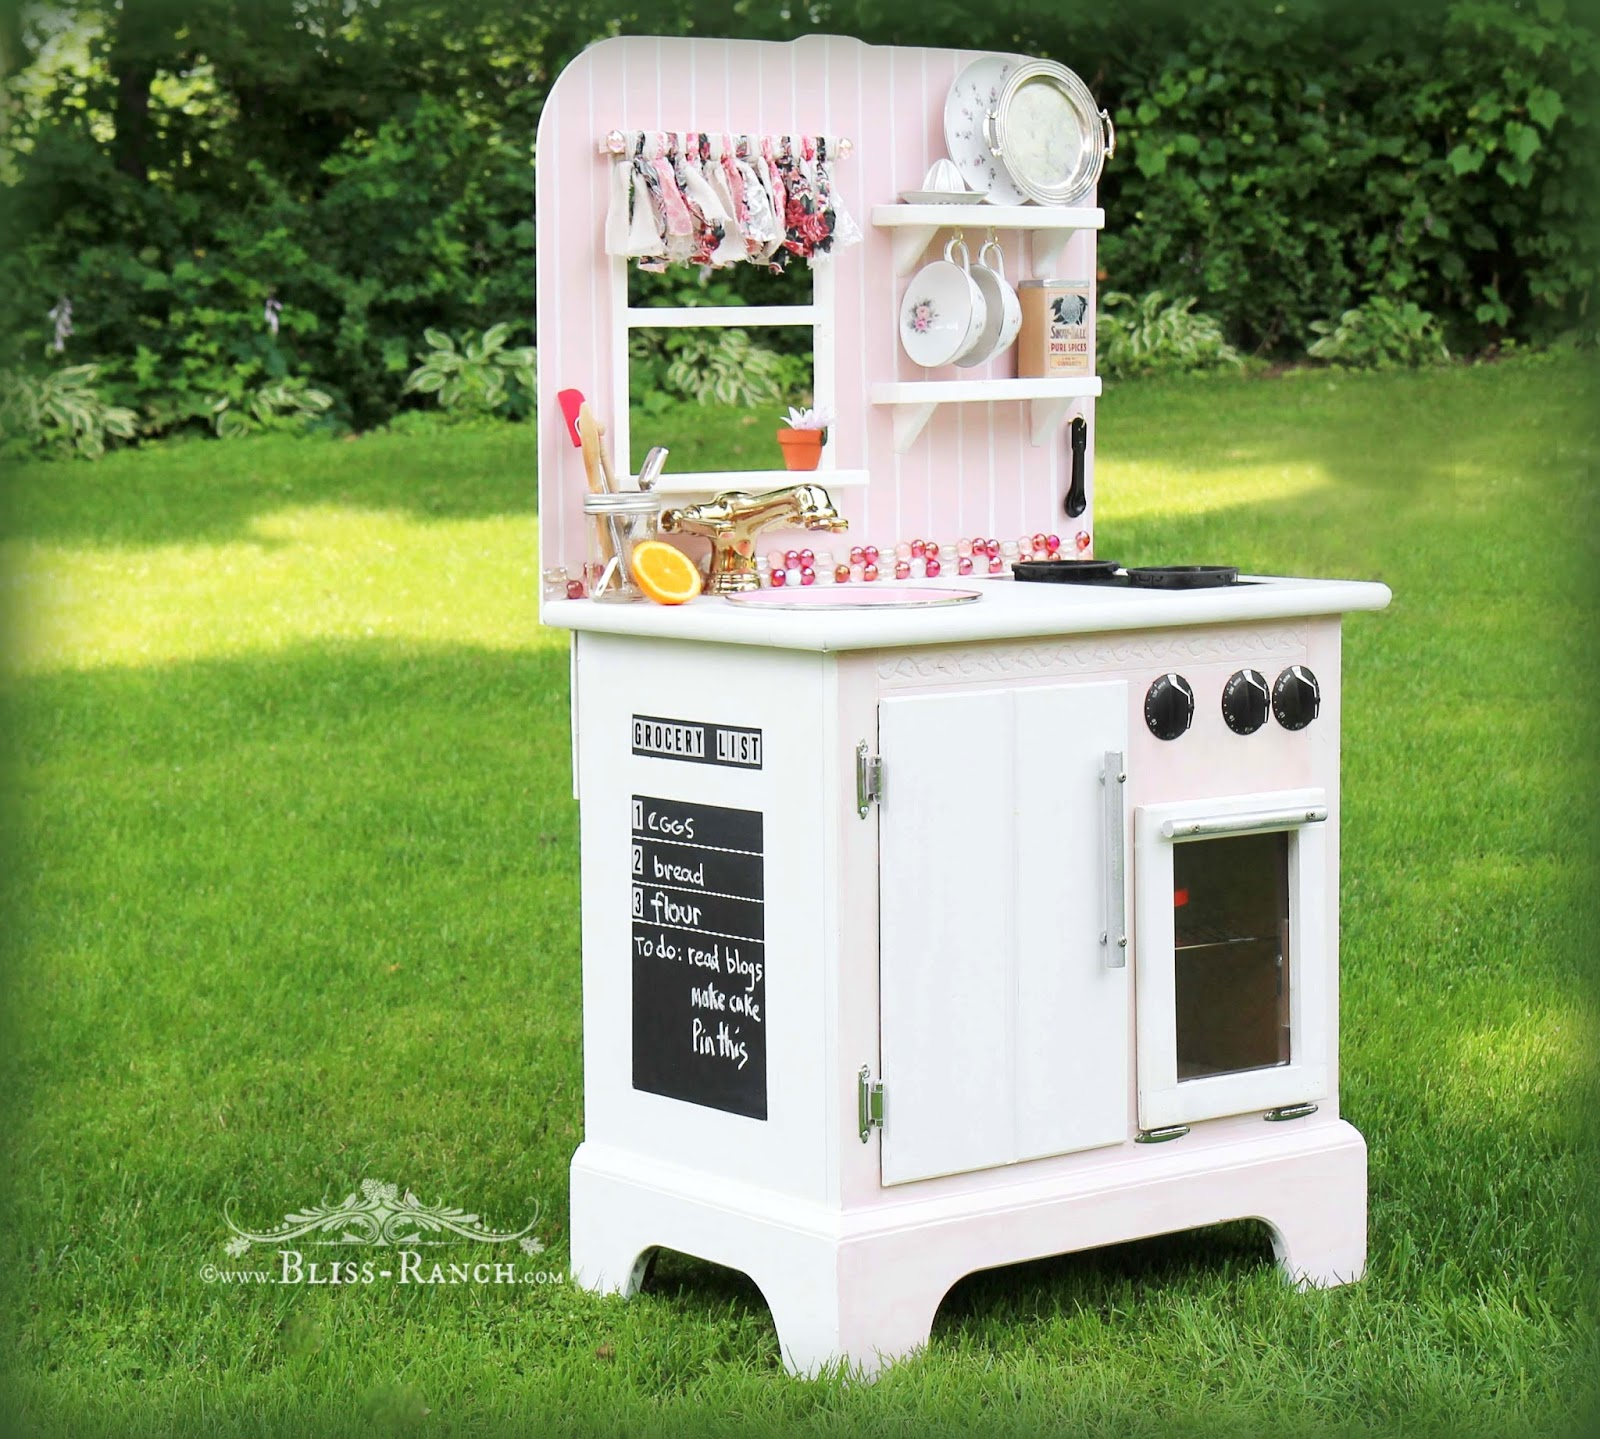 Upcycled Nightstand to Play Kitchen Bliss-Ranch.com #playkitchen #repurposedfurniture #kids